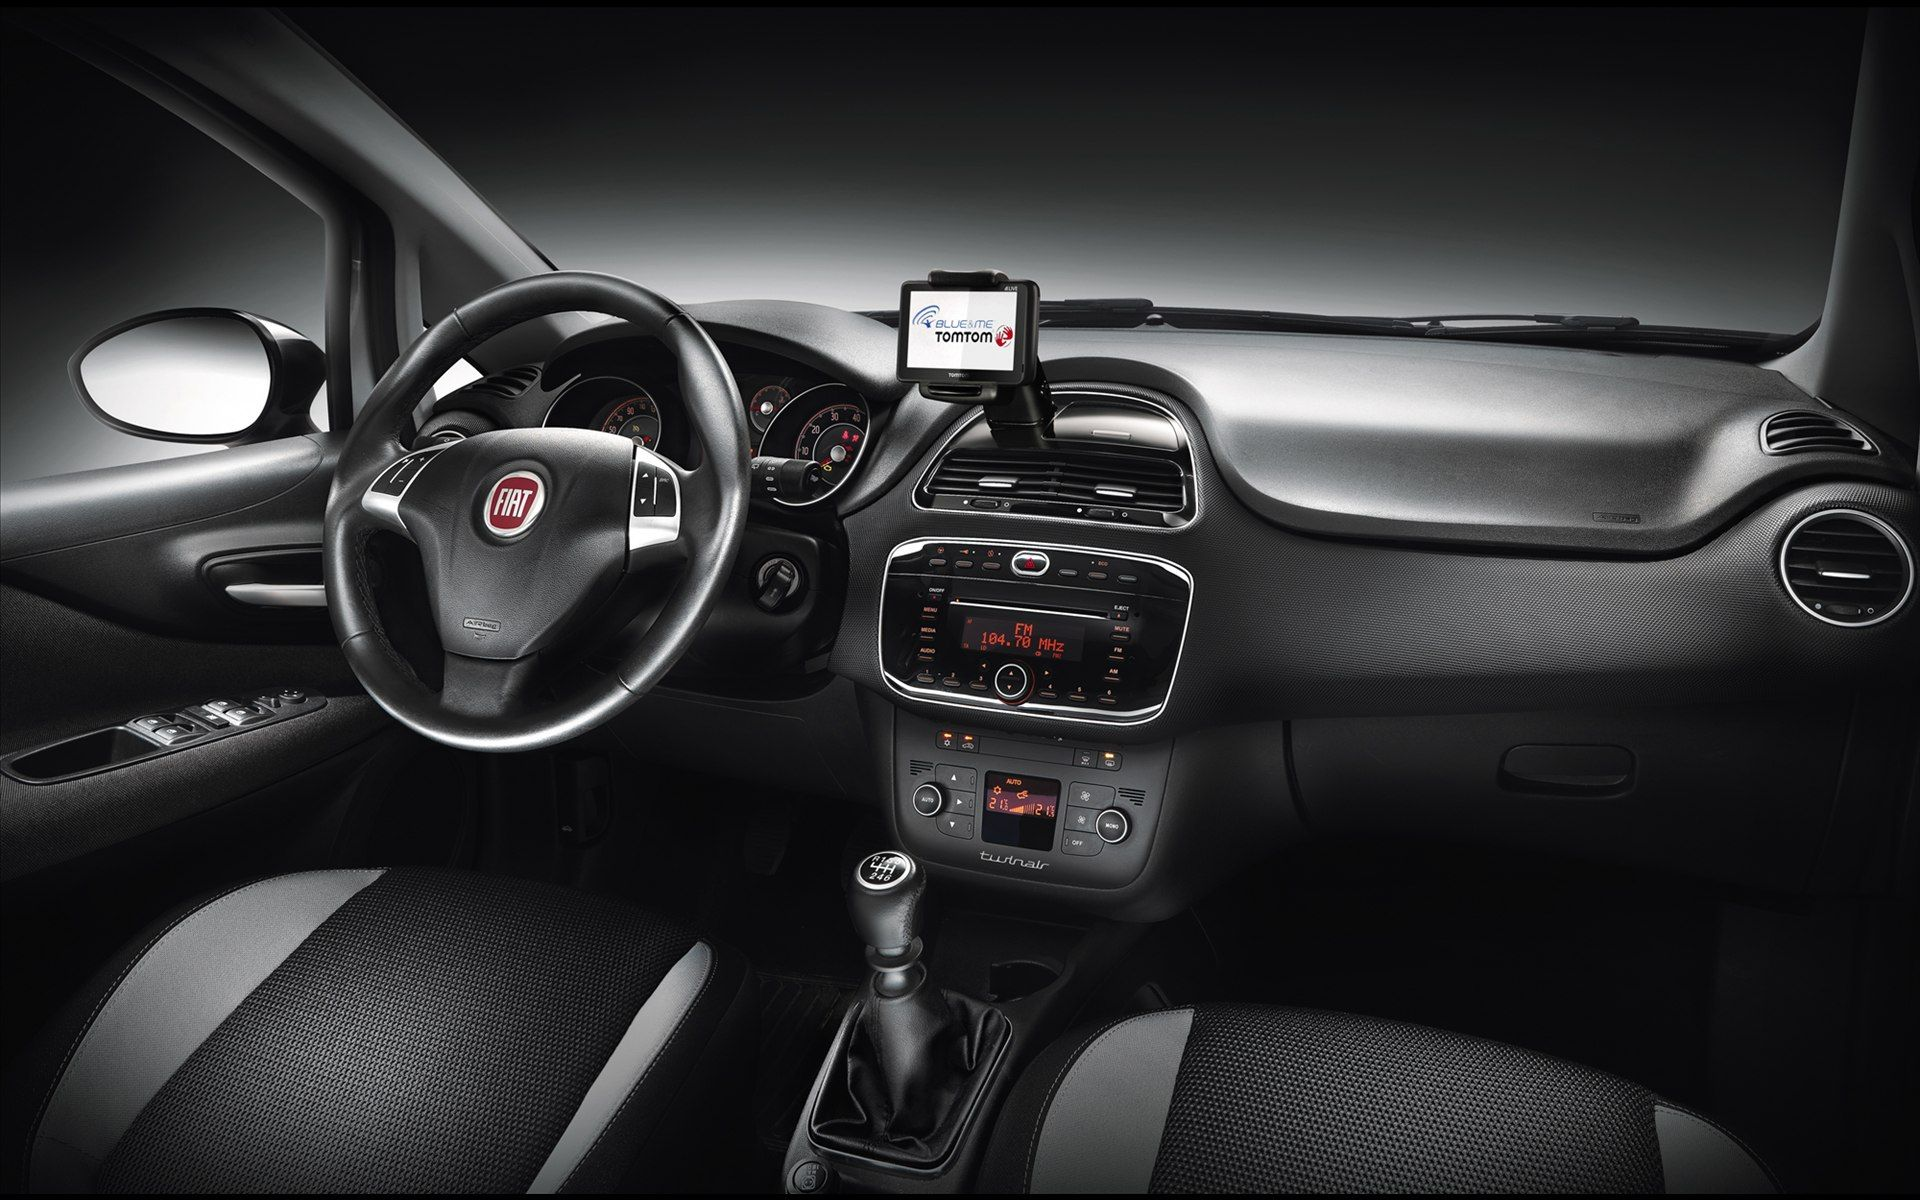 Fiat Punto 2012 Interior 2 Jpg 1920 1200 Fiat Fiat Cars Fiat